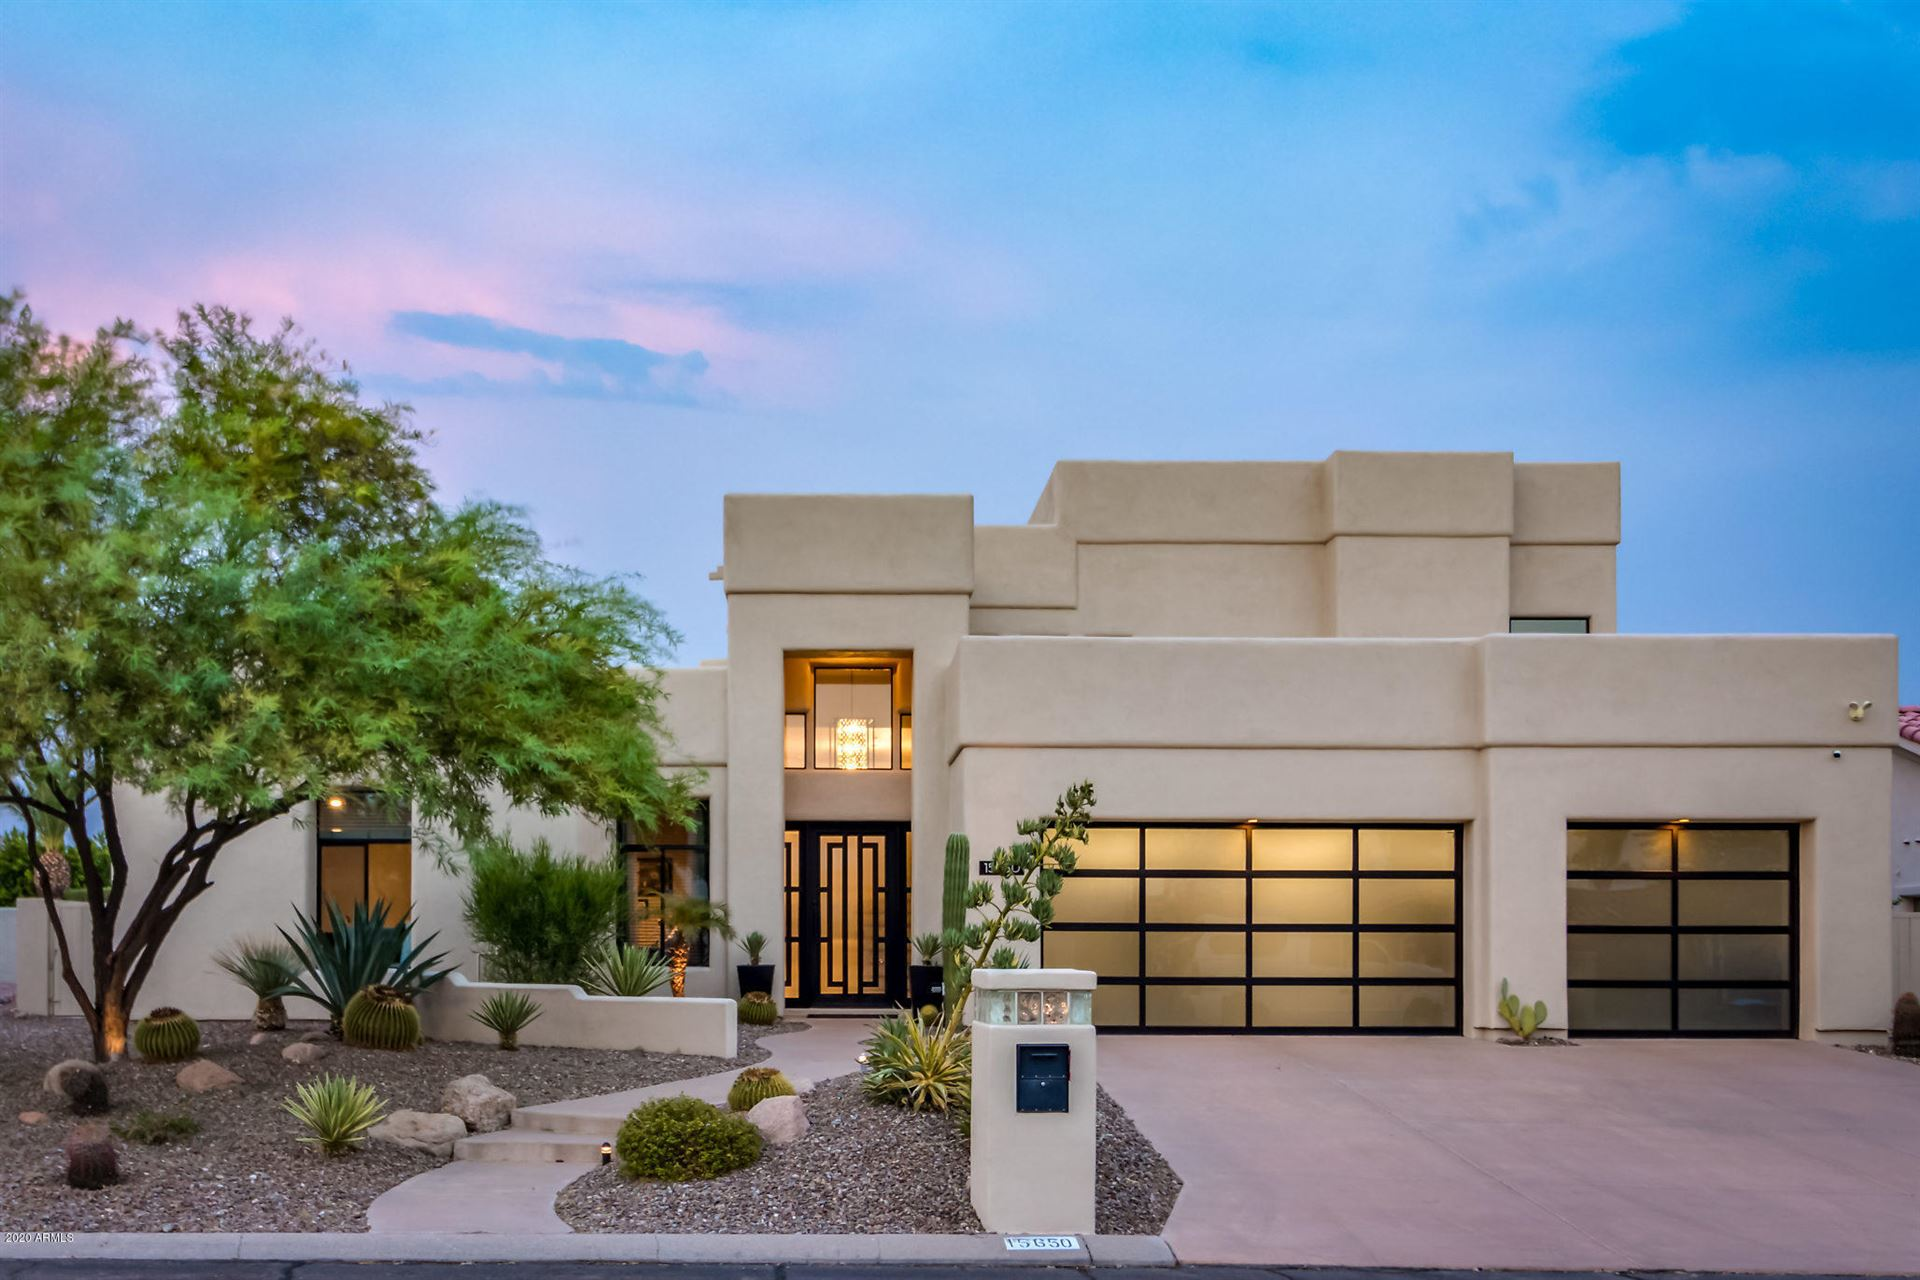 15650 E MUSTANG Drive, Fountain Hills, AZ 85268 - MLS#: 6124118